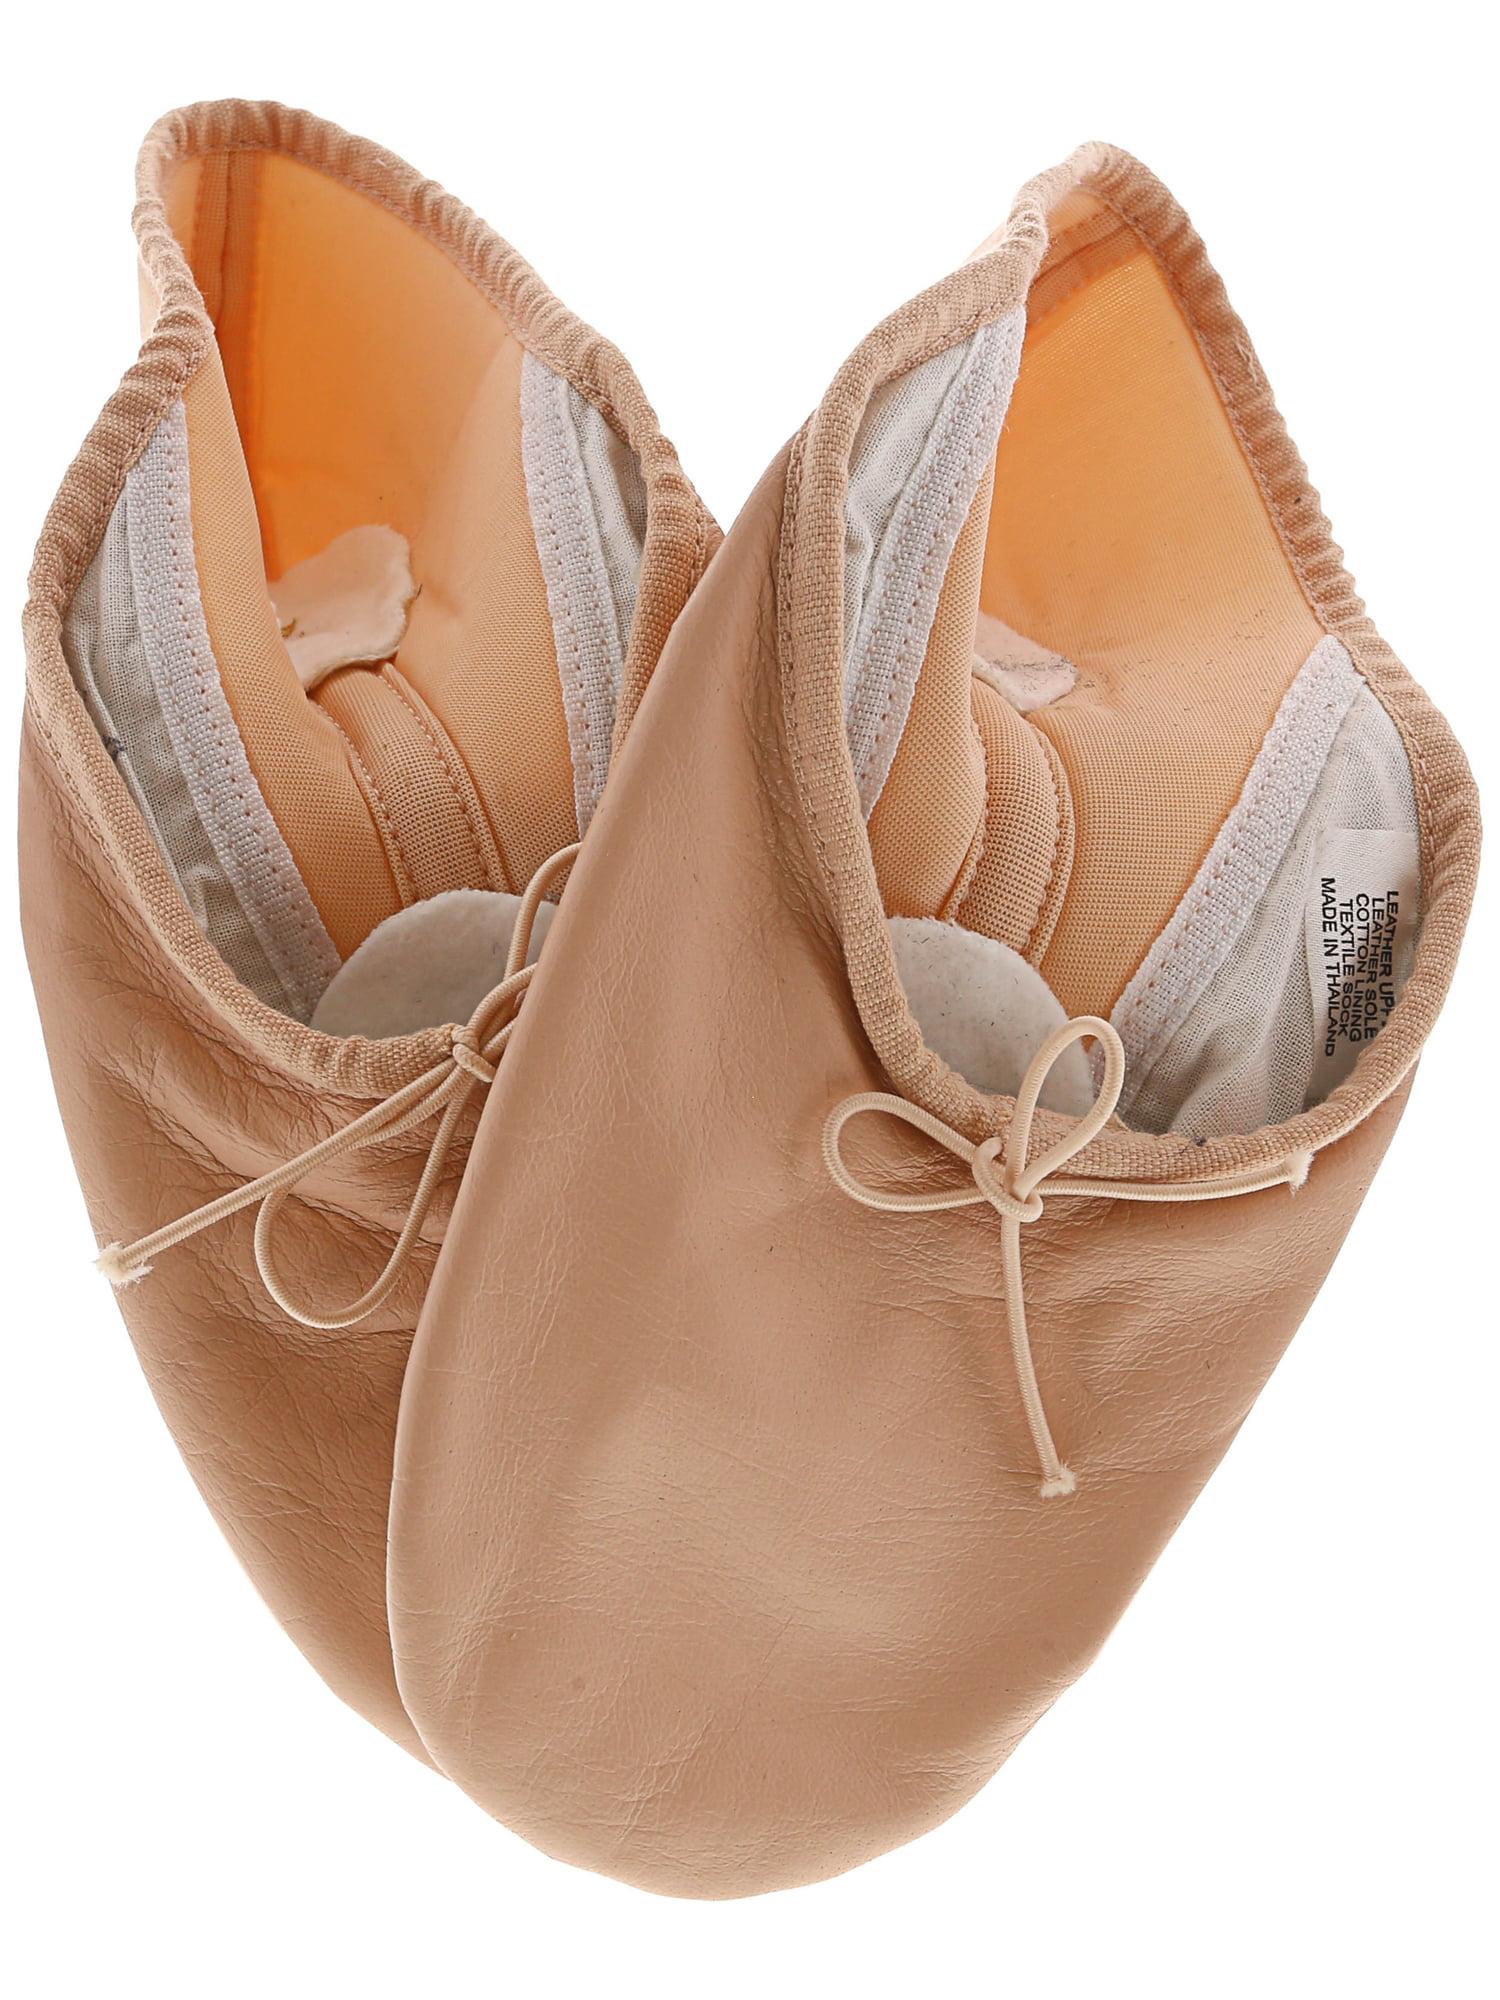 Bloch Women's Neo Hybrid Pink Leather Ballet Flat - 7.5M